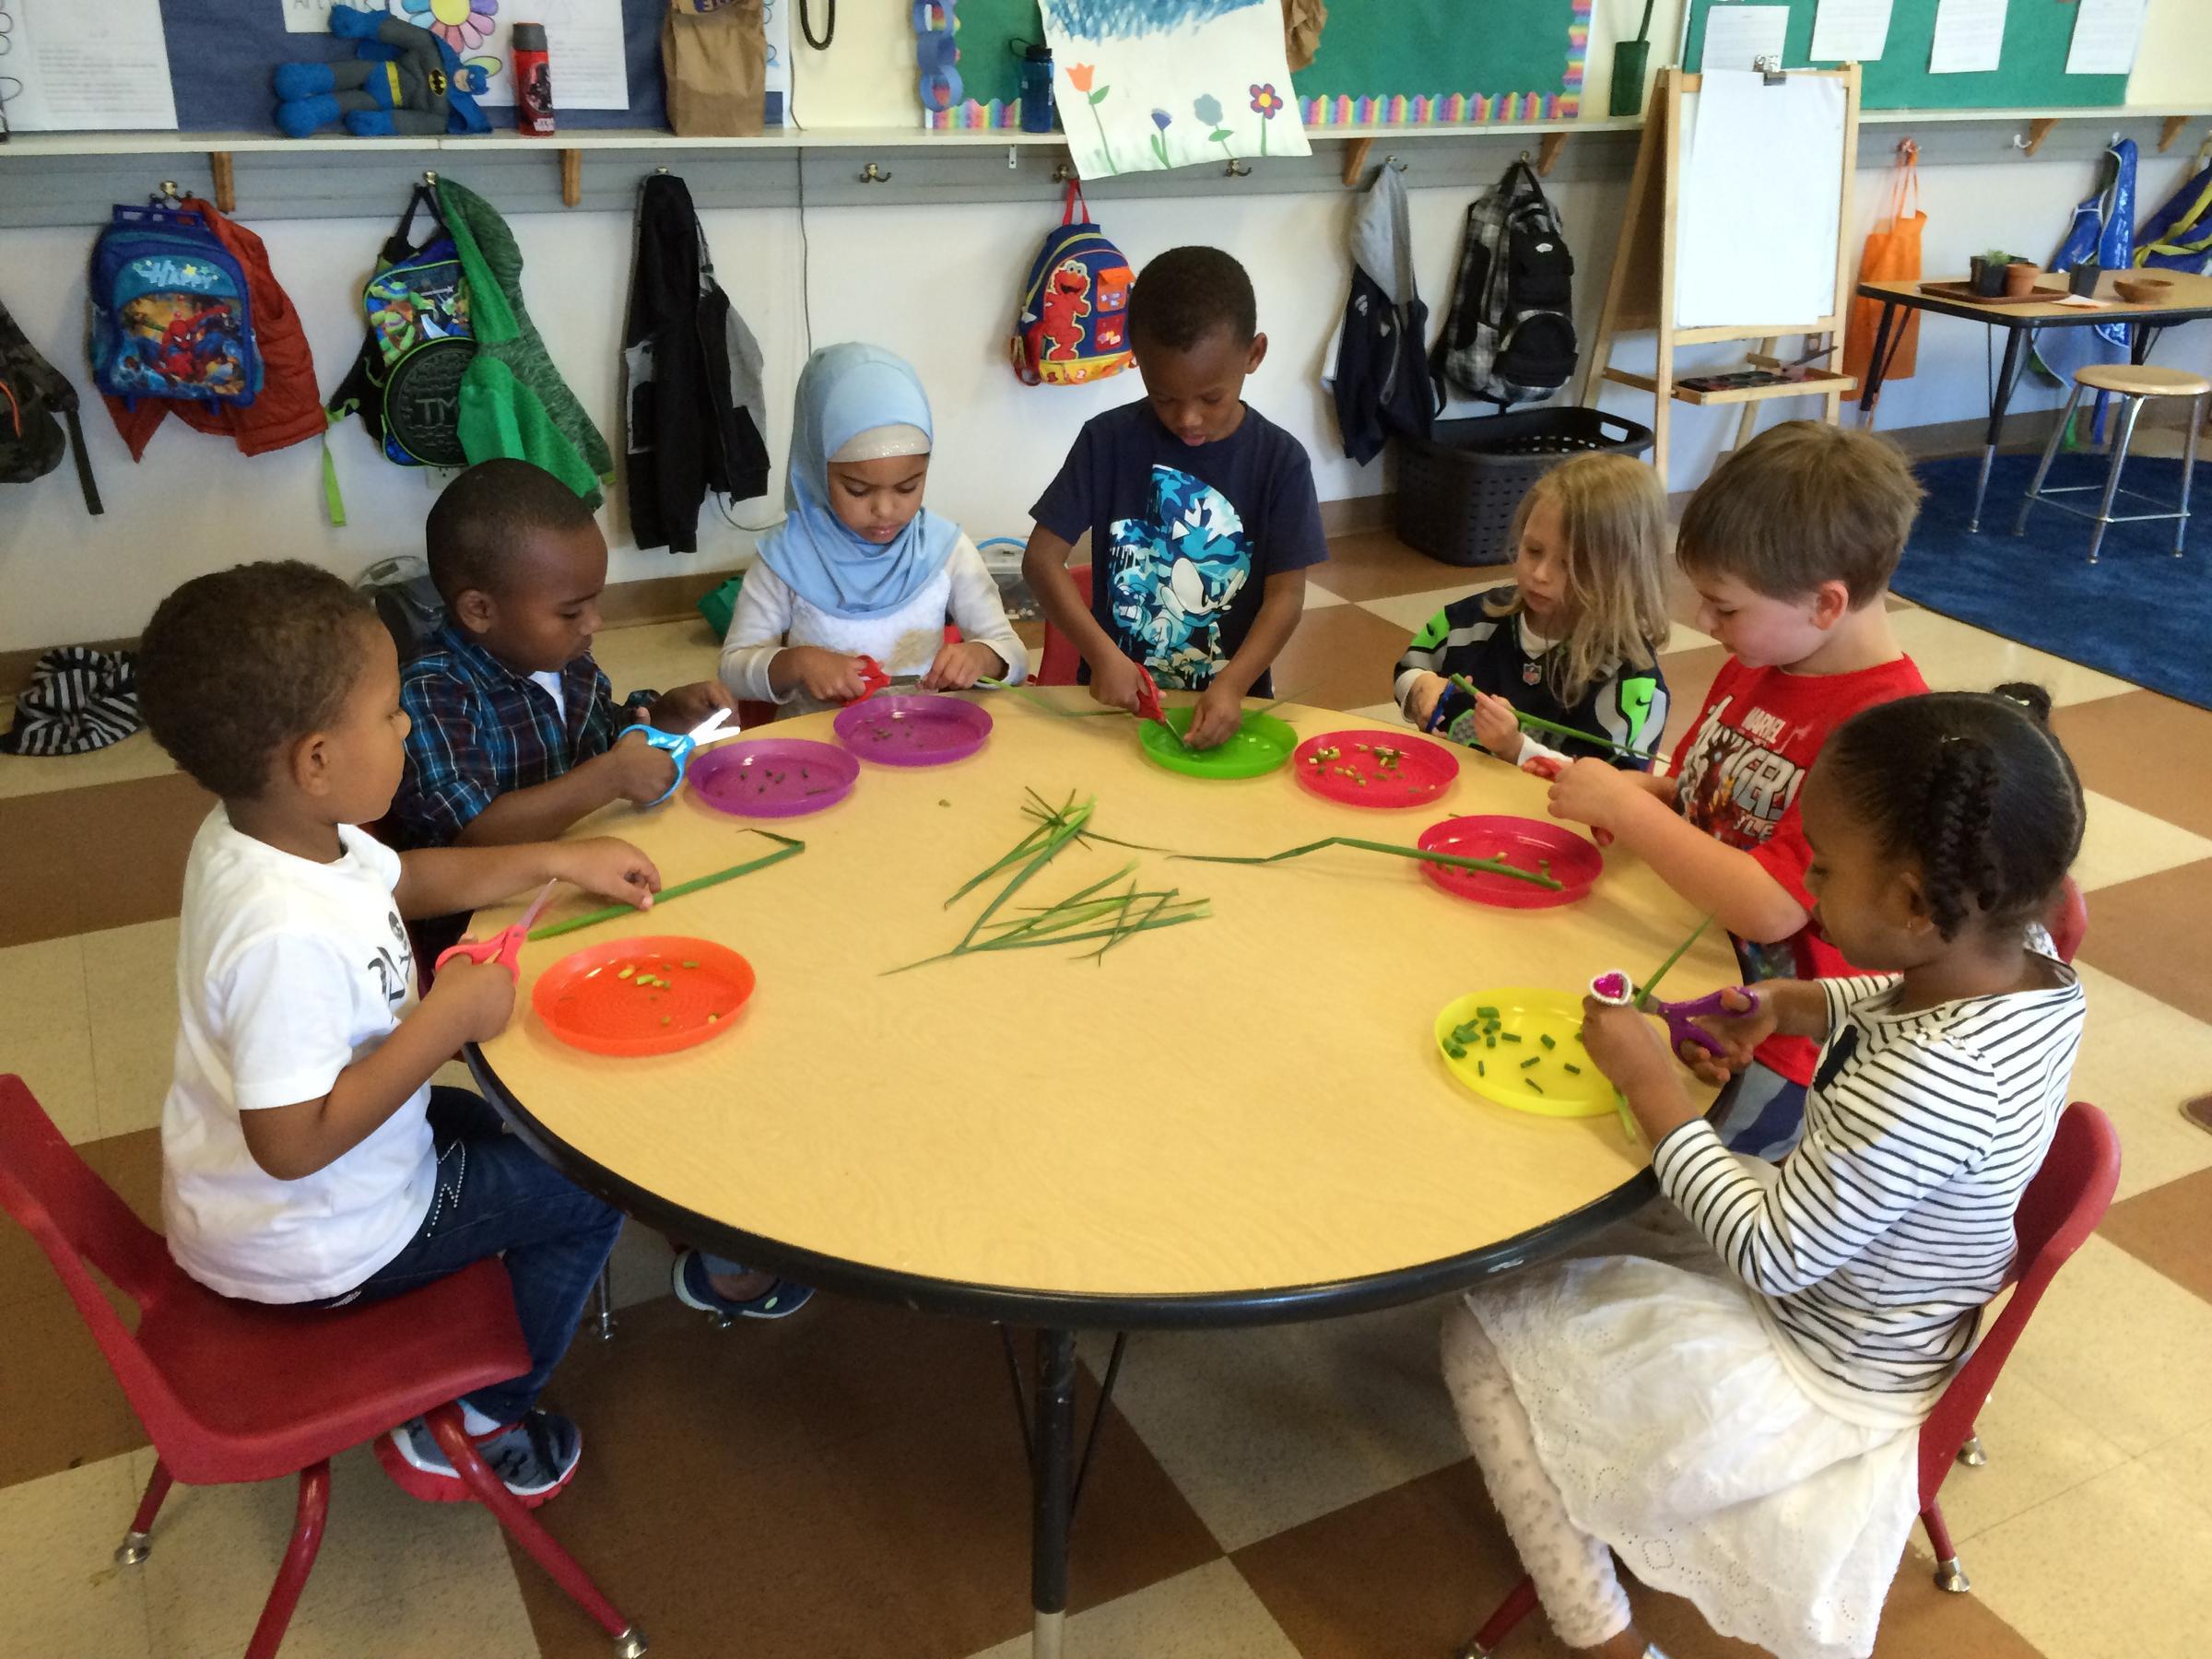 preschool learning alliance training teachers racial bias starts as early as preschool study 216